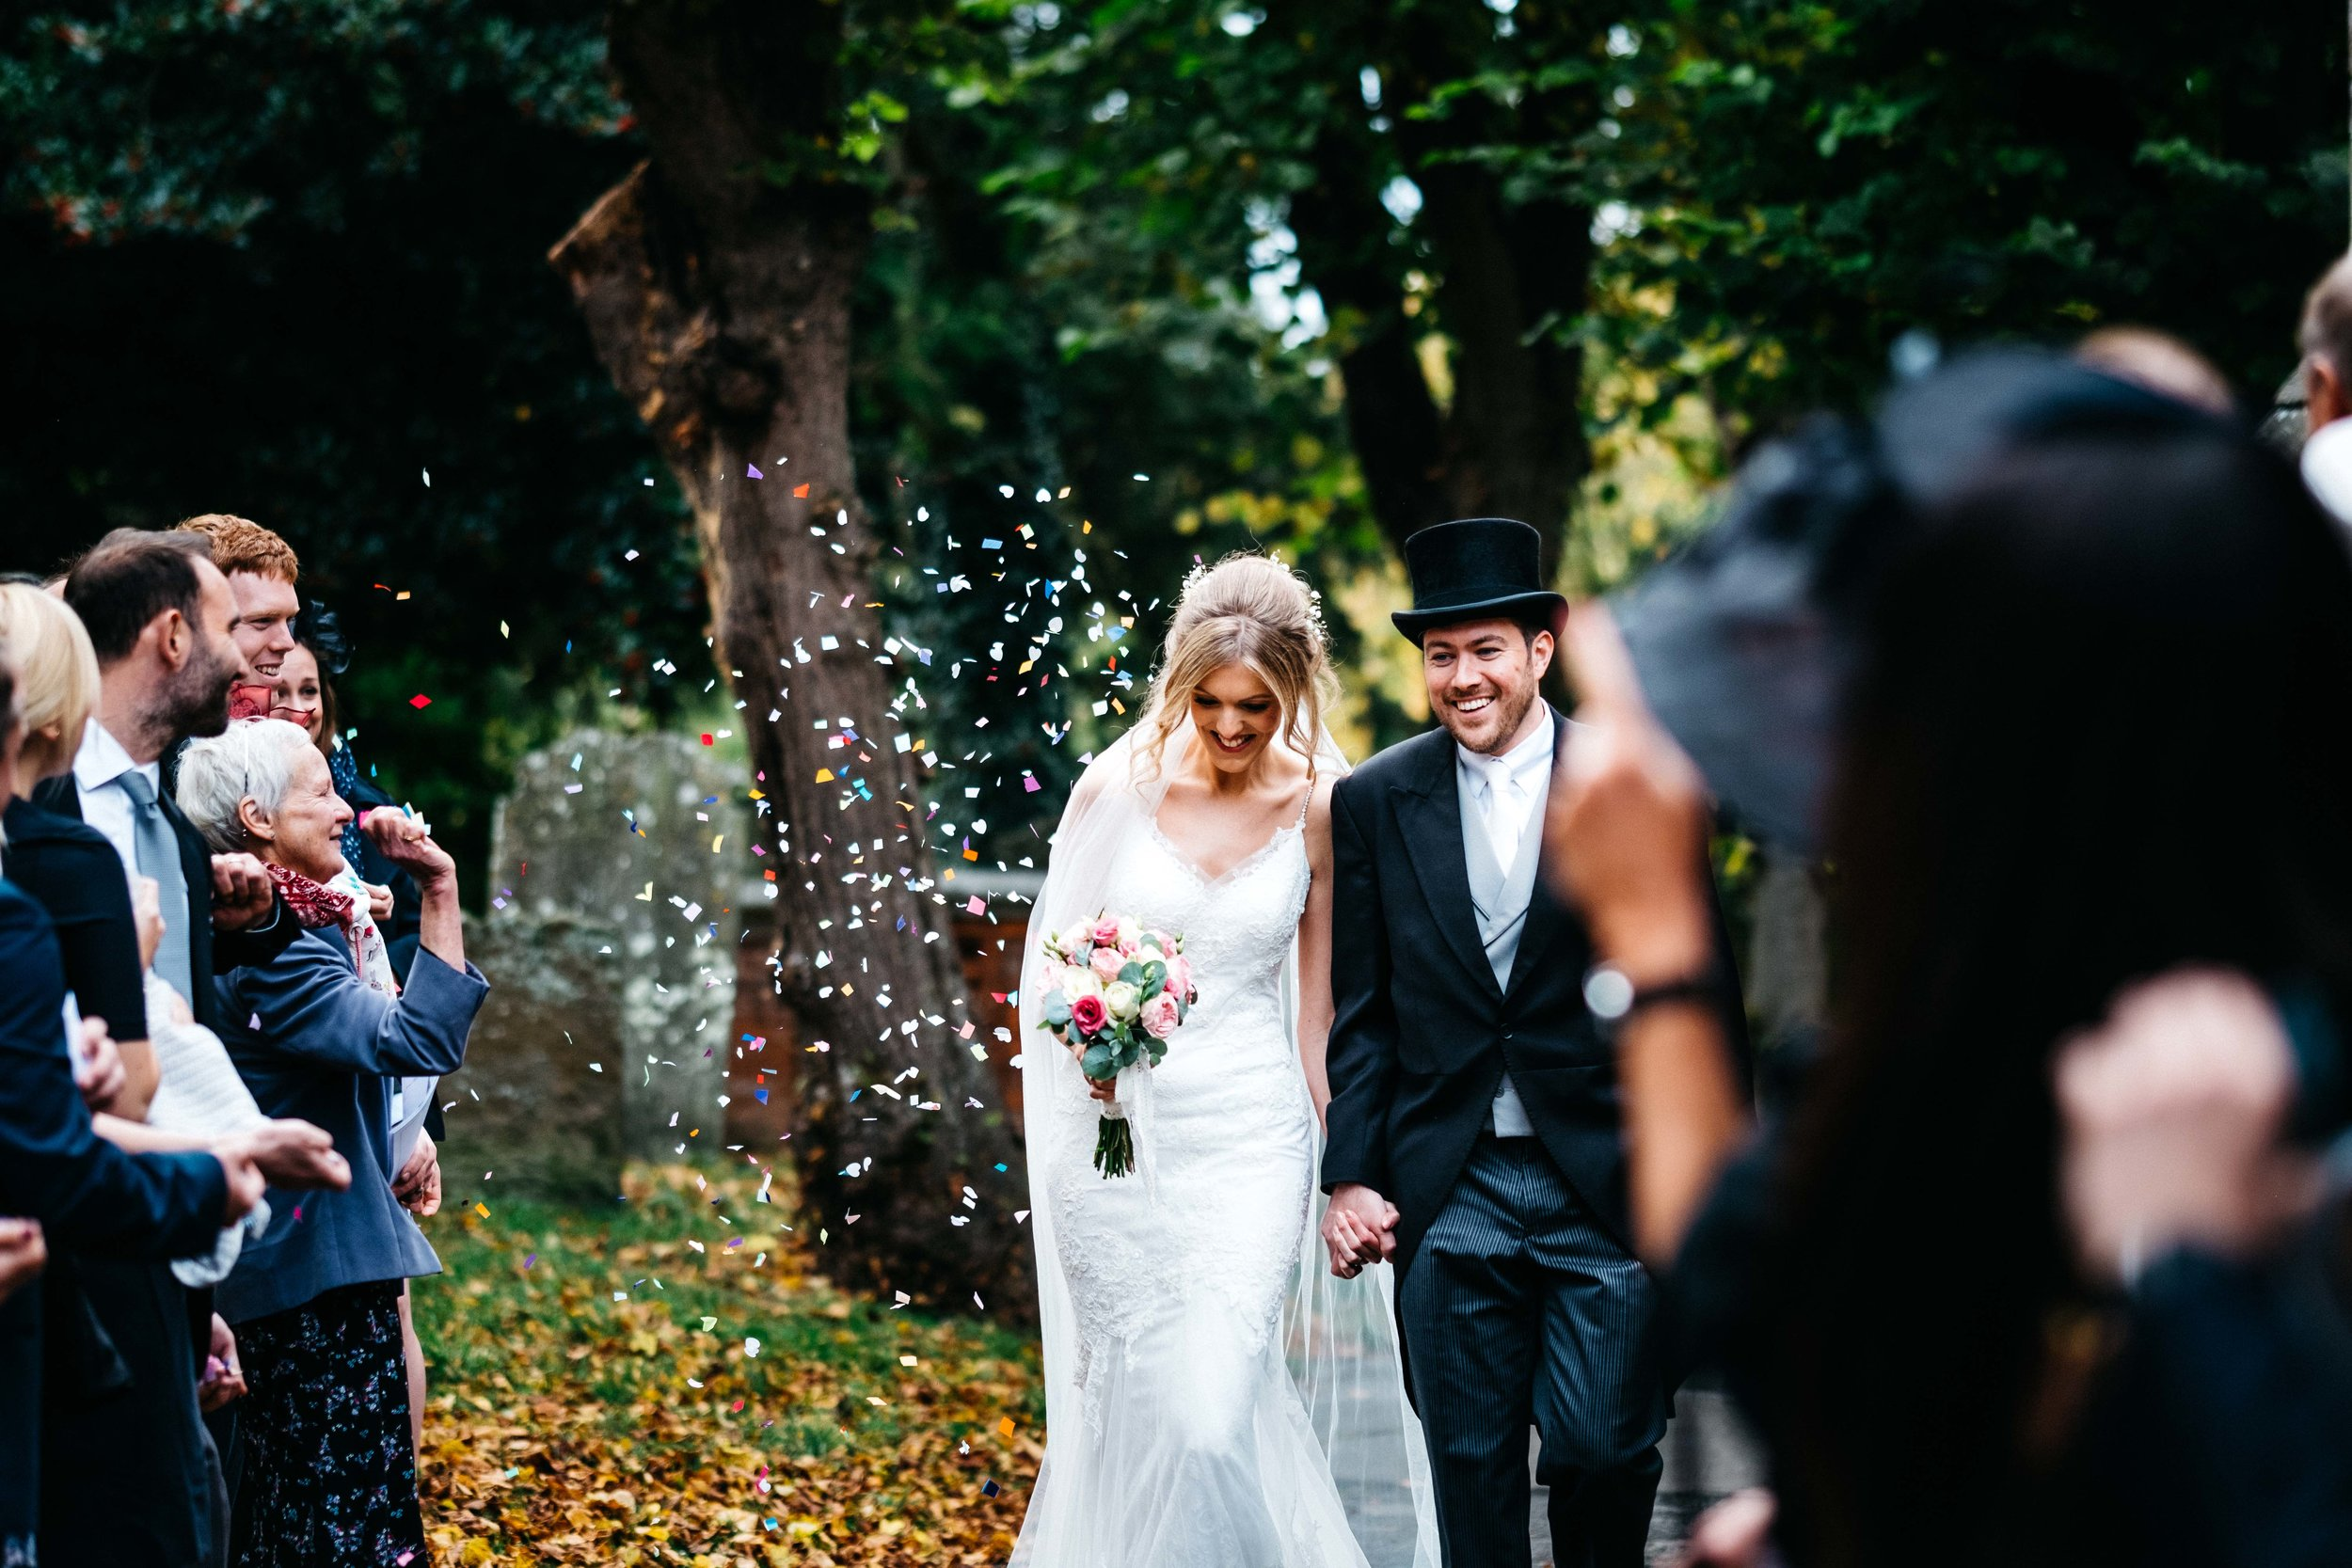 Confetti at the wedding